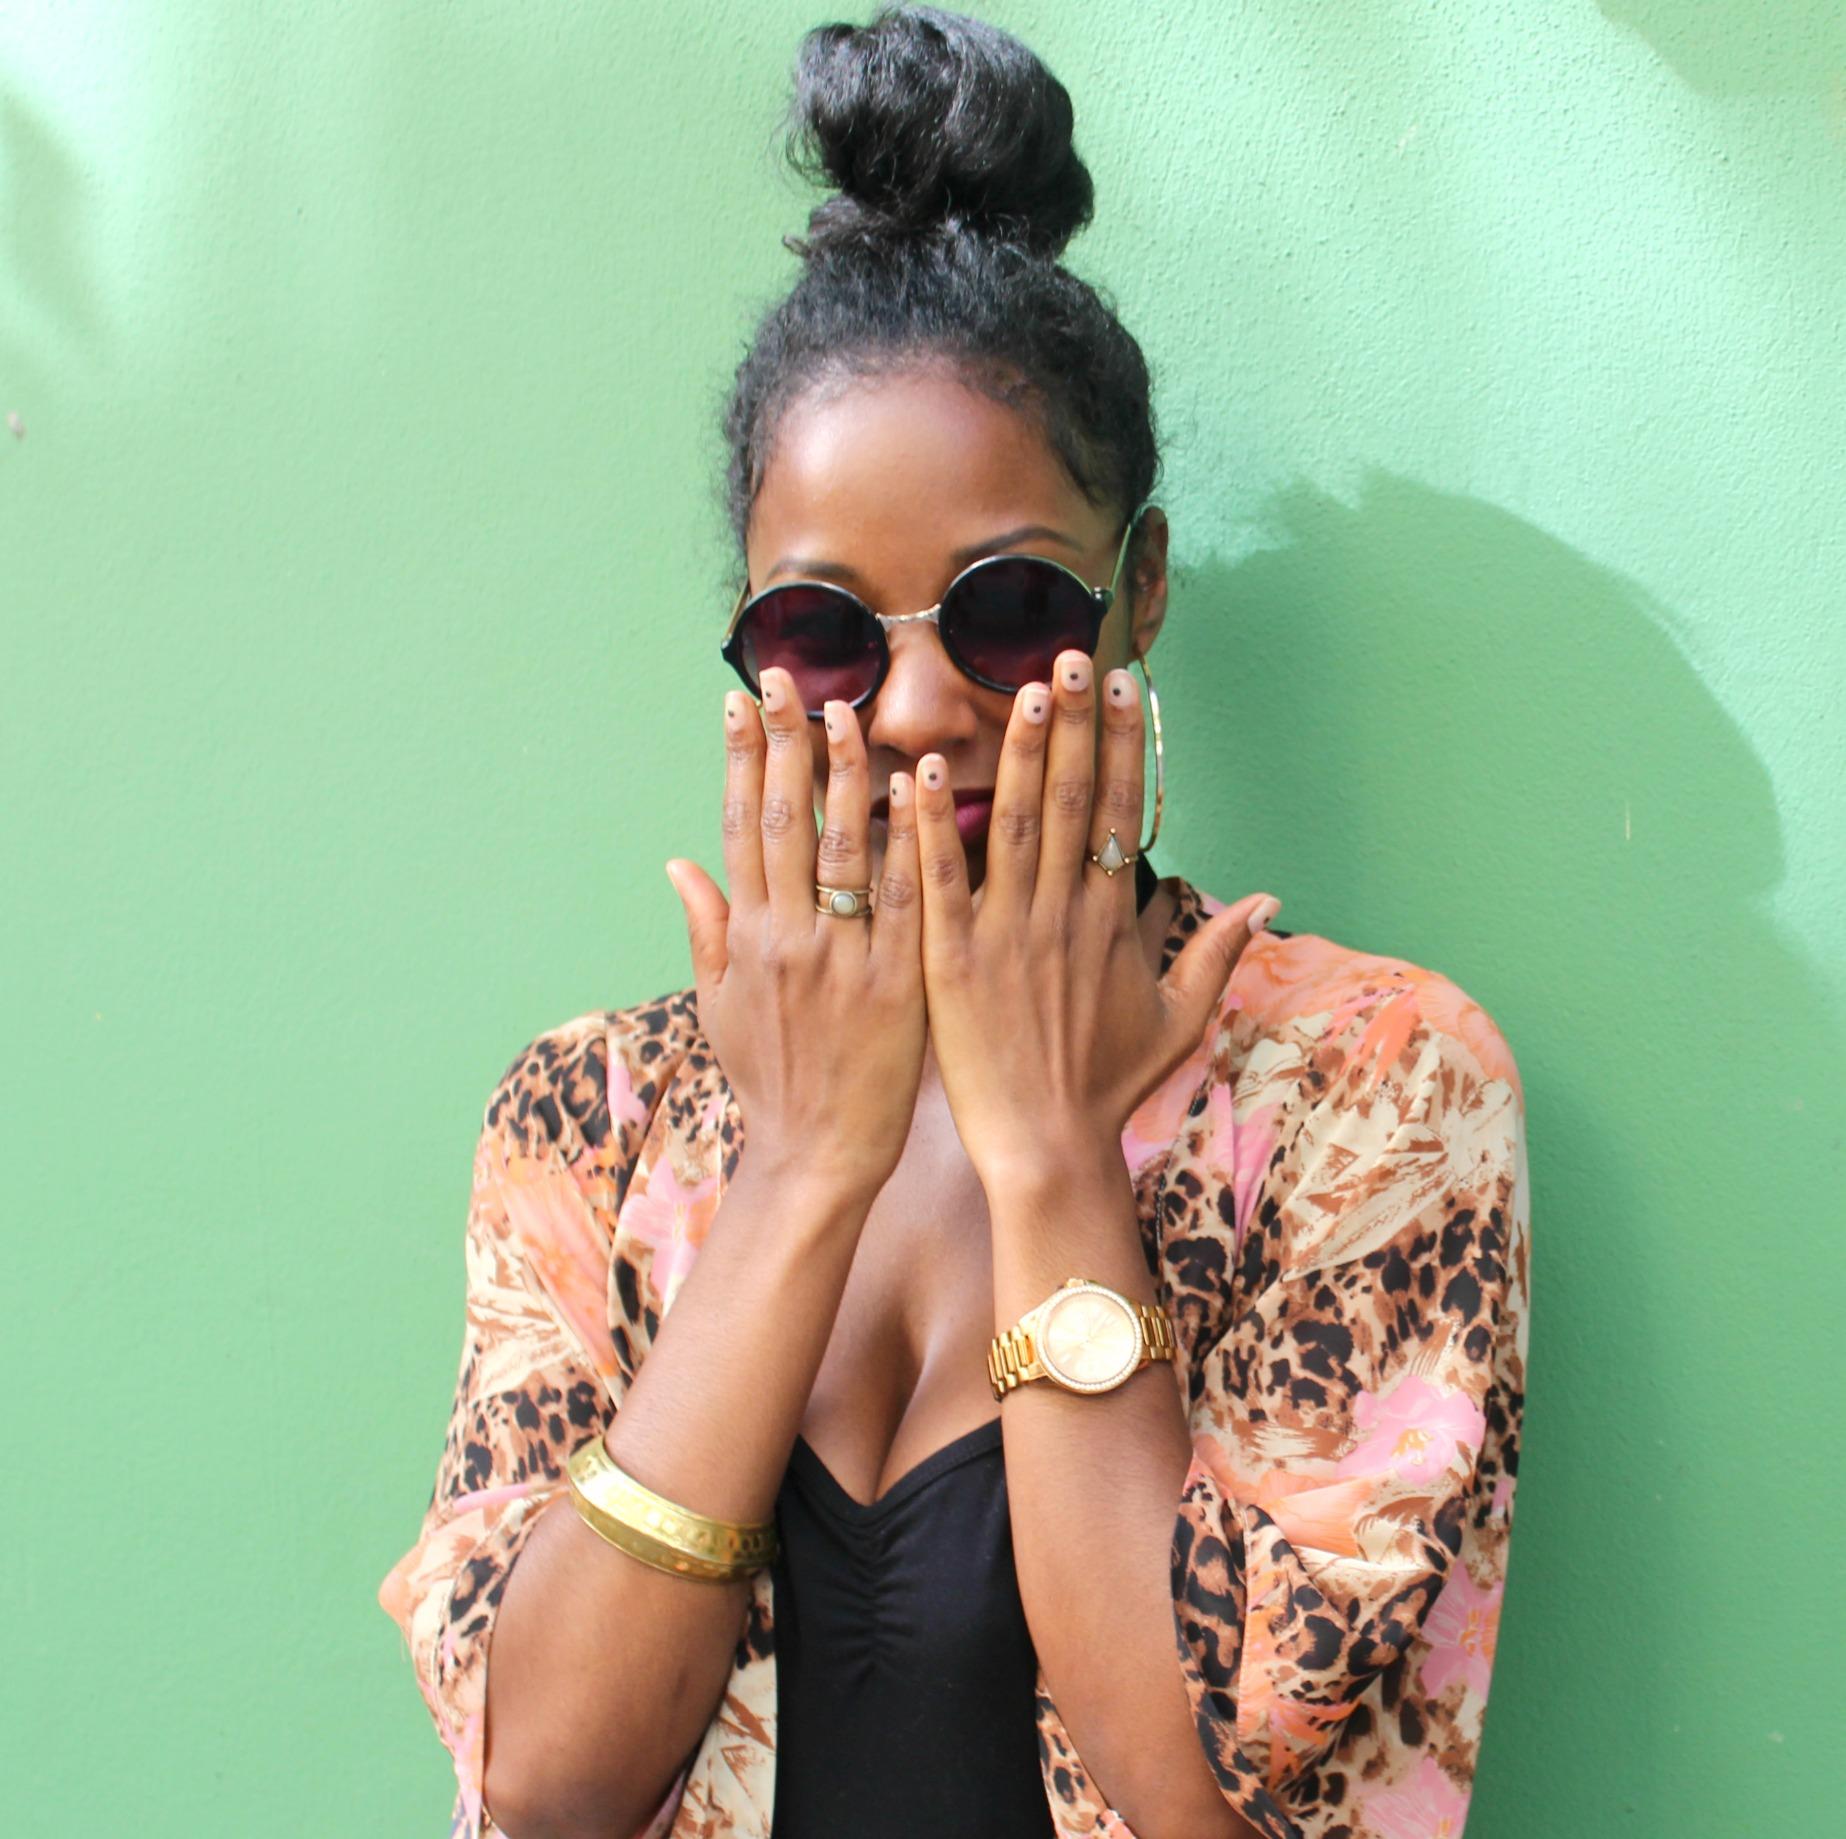 A dot manicure inspired by Sonique Saturday - a cool LA blogger